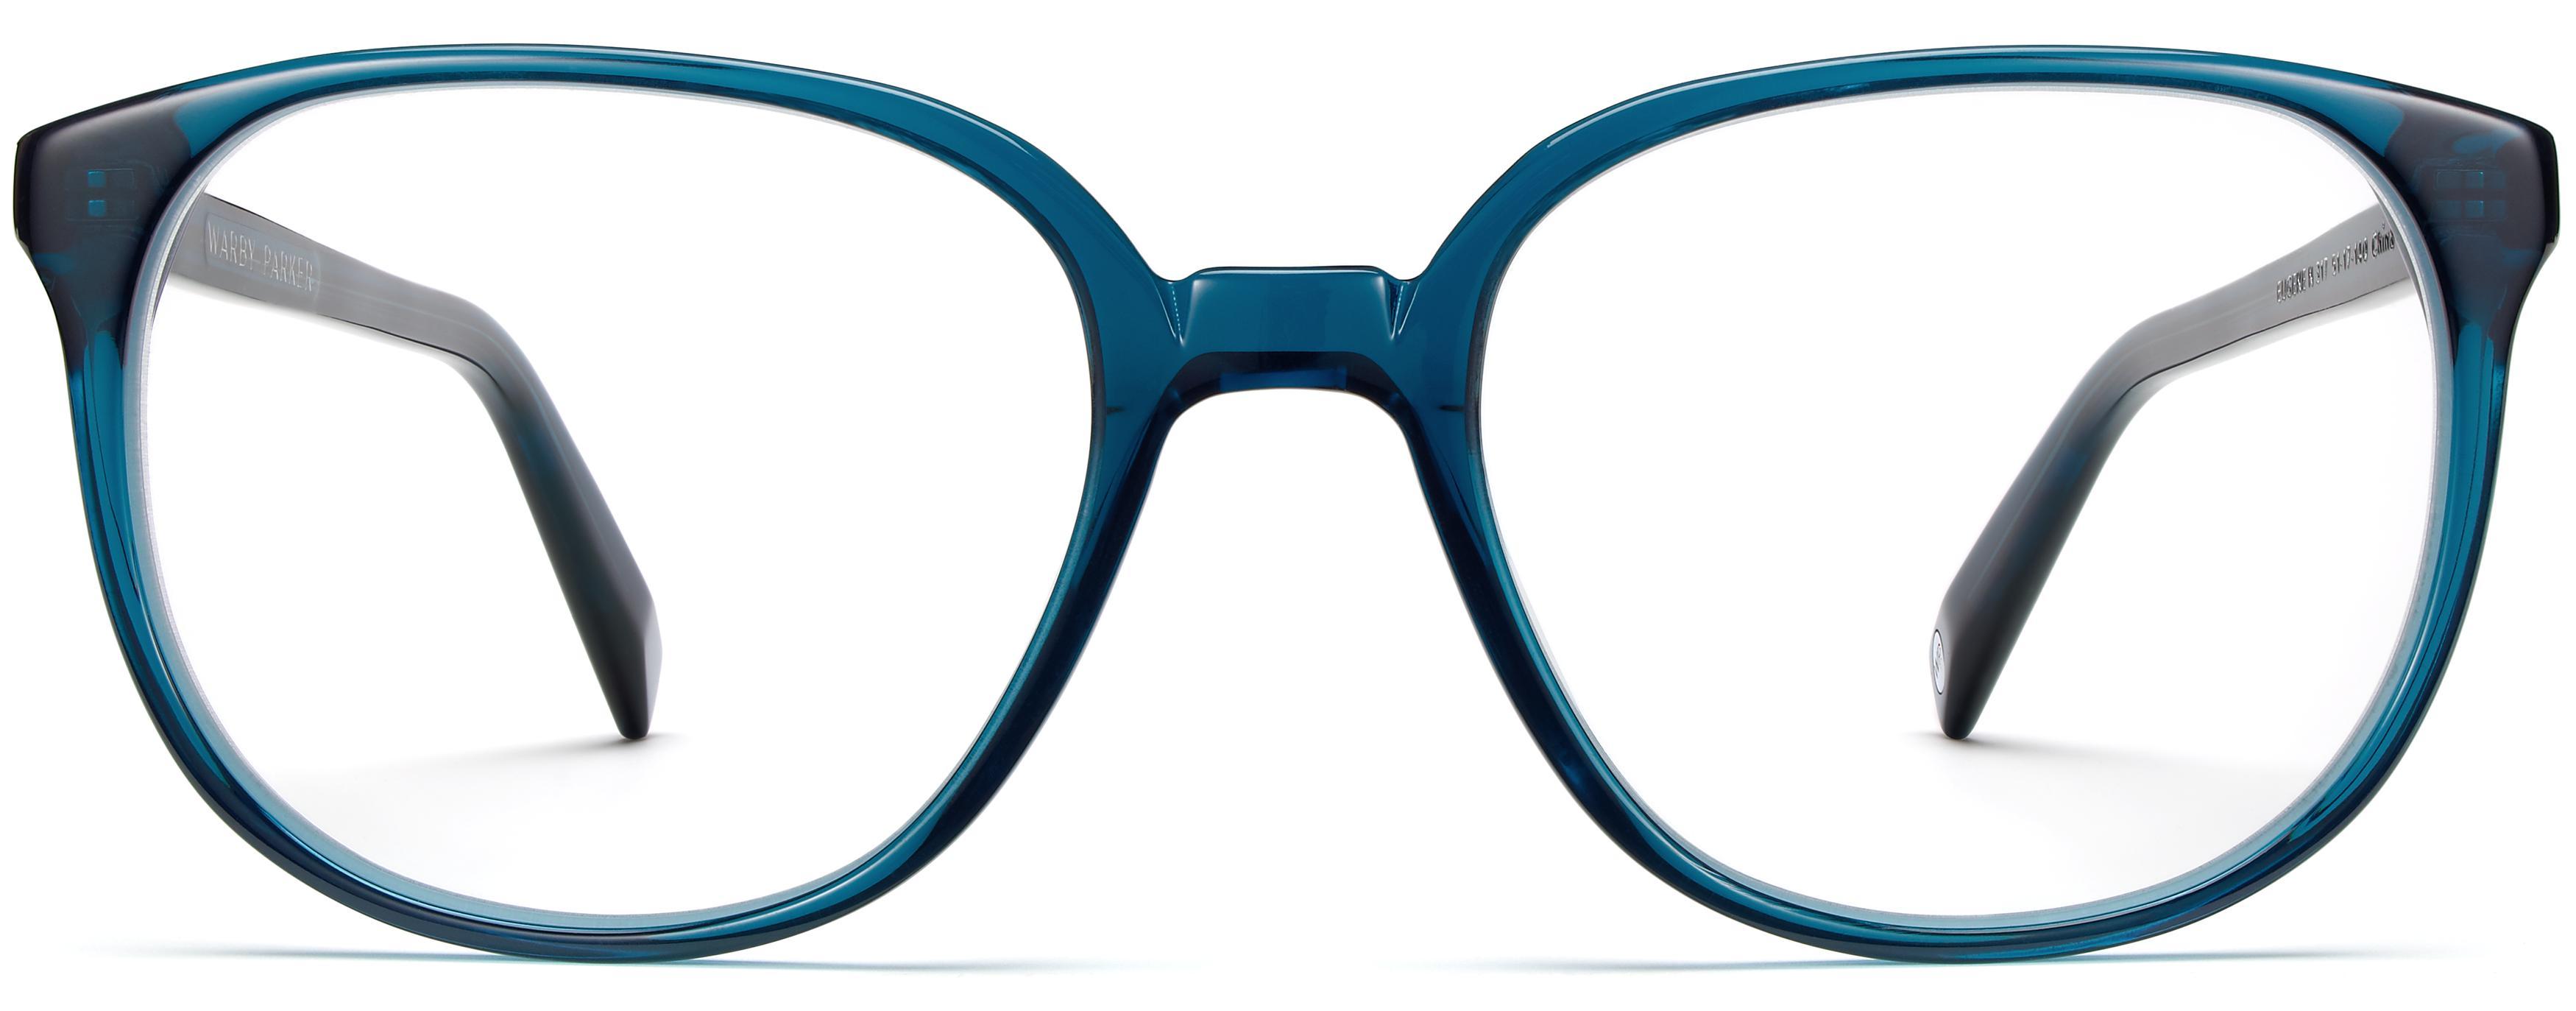 6f8b718cac0 Men s Eyeglasses